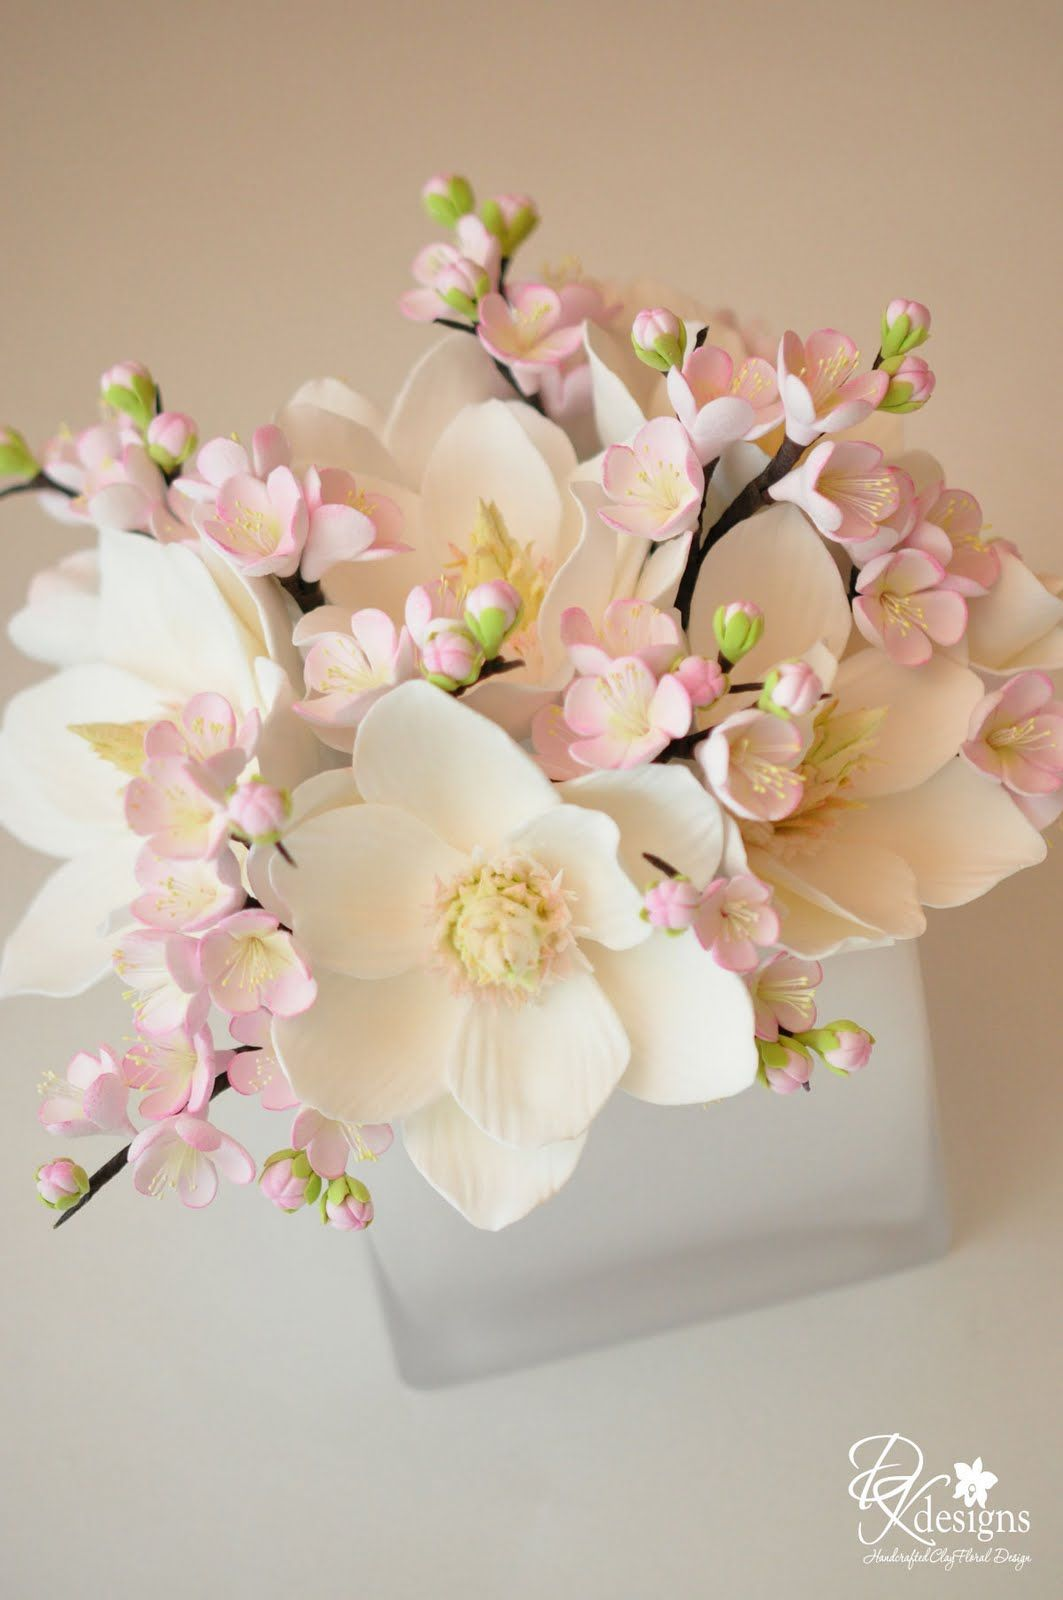 delicate blush and white floral arrangement (magnolias and plum